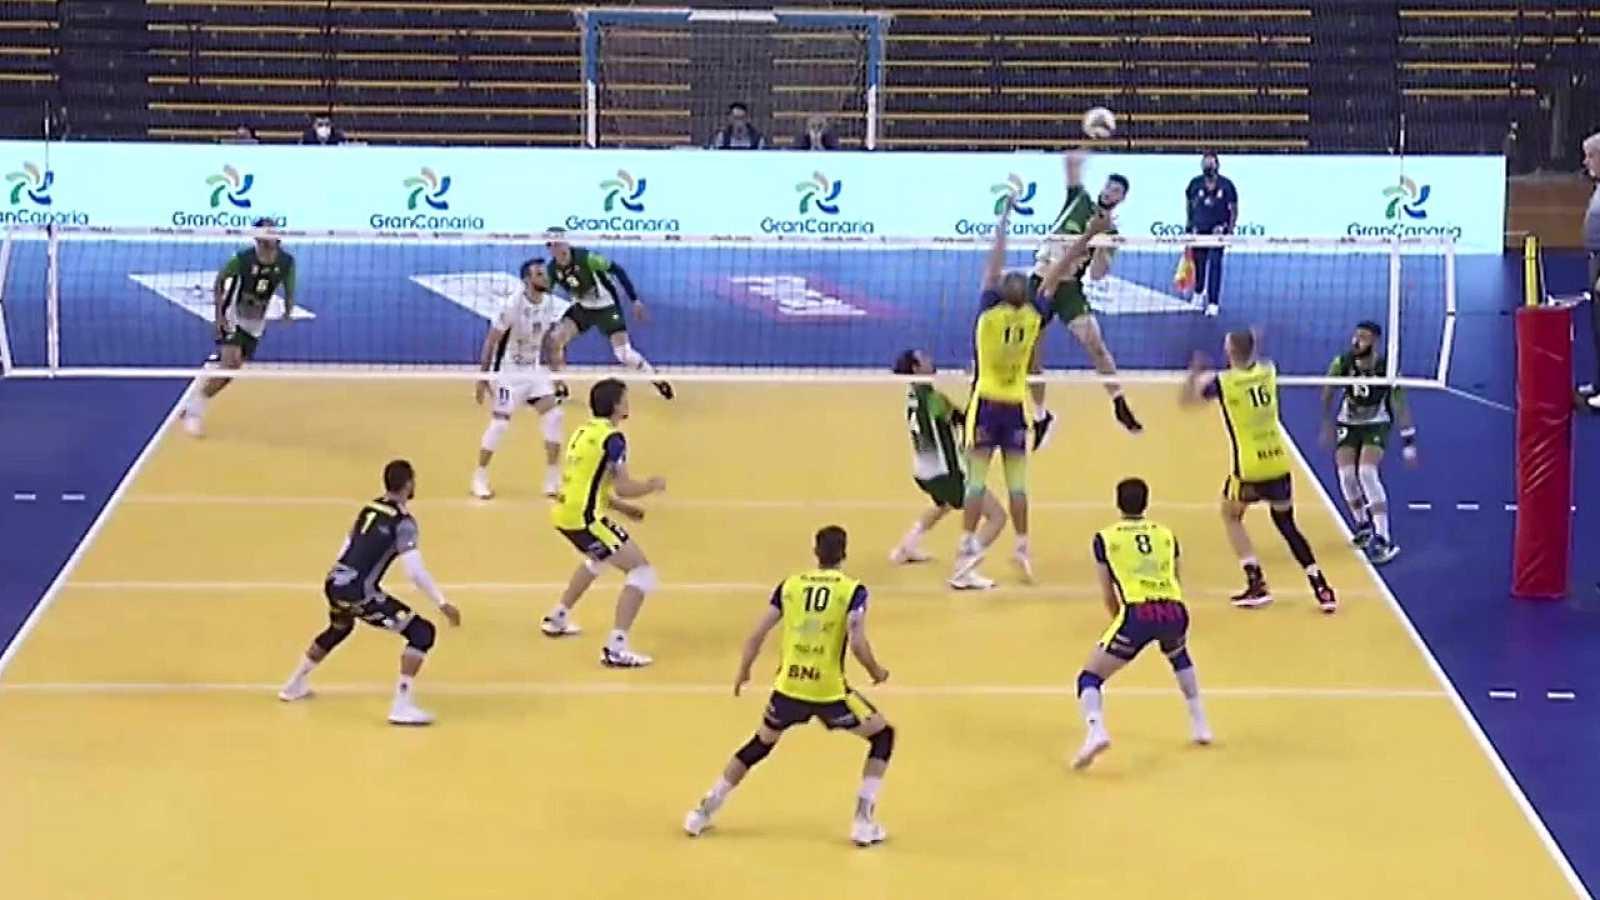 Voleibol - Resumen Play off. Superliga masculina - ver ahora